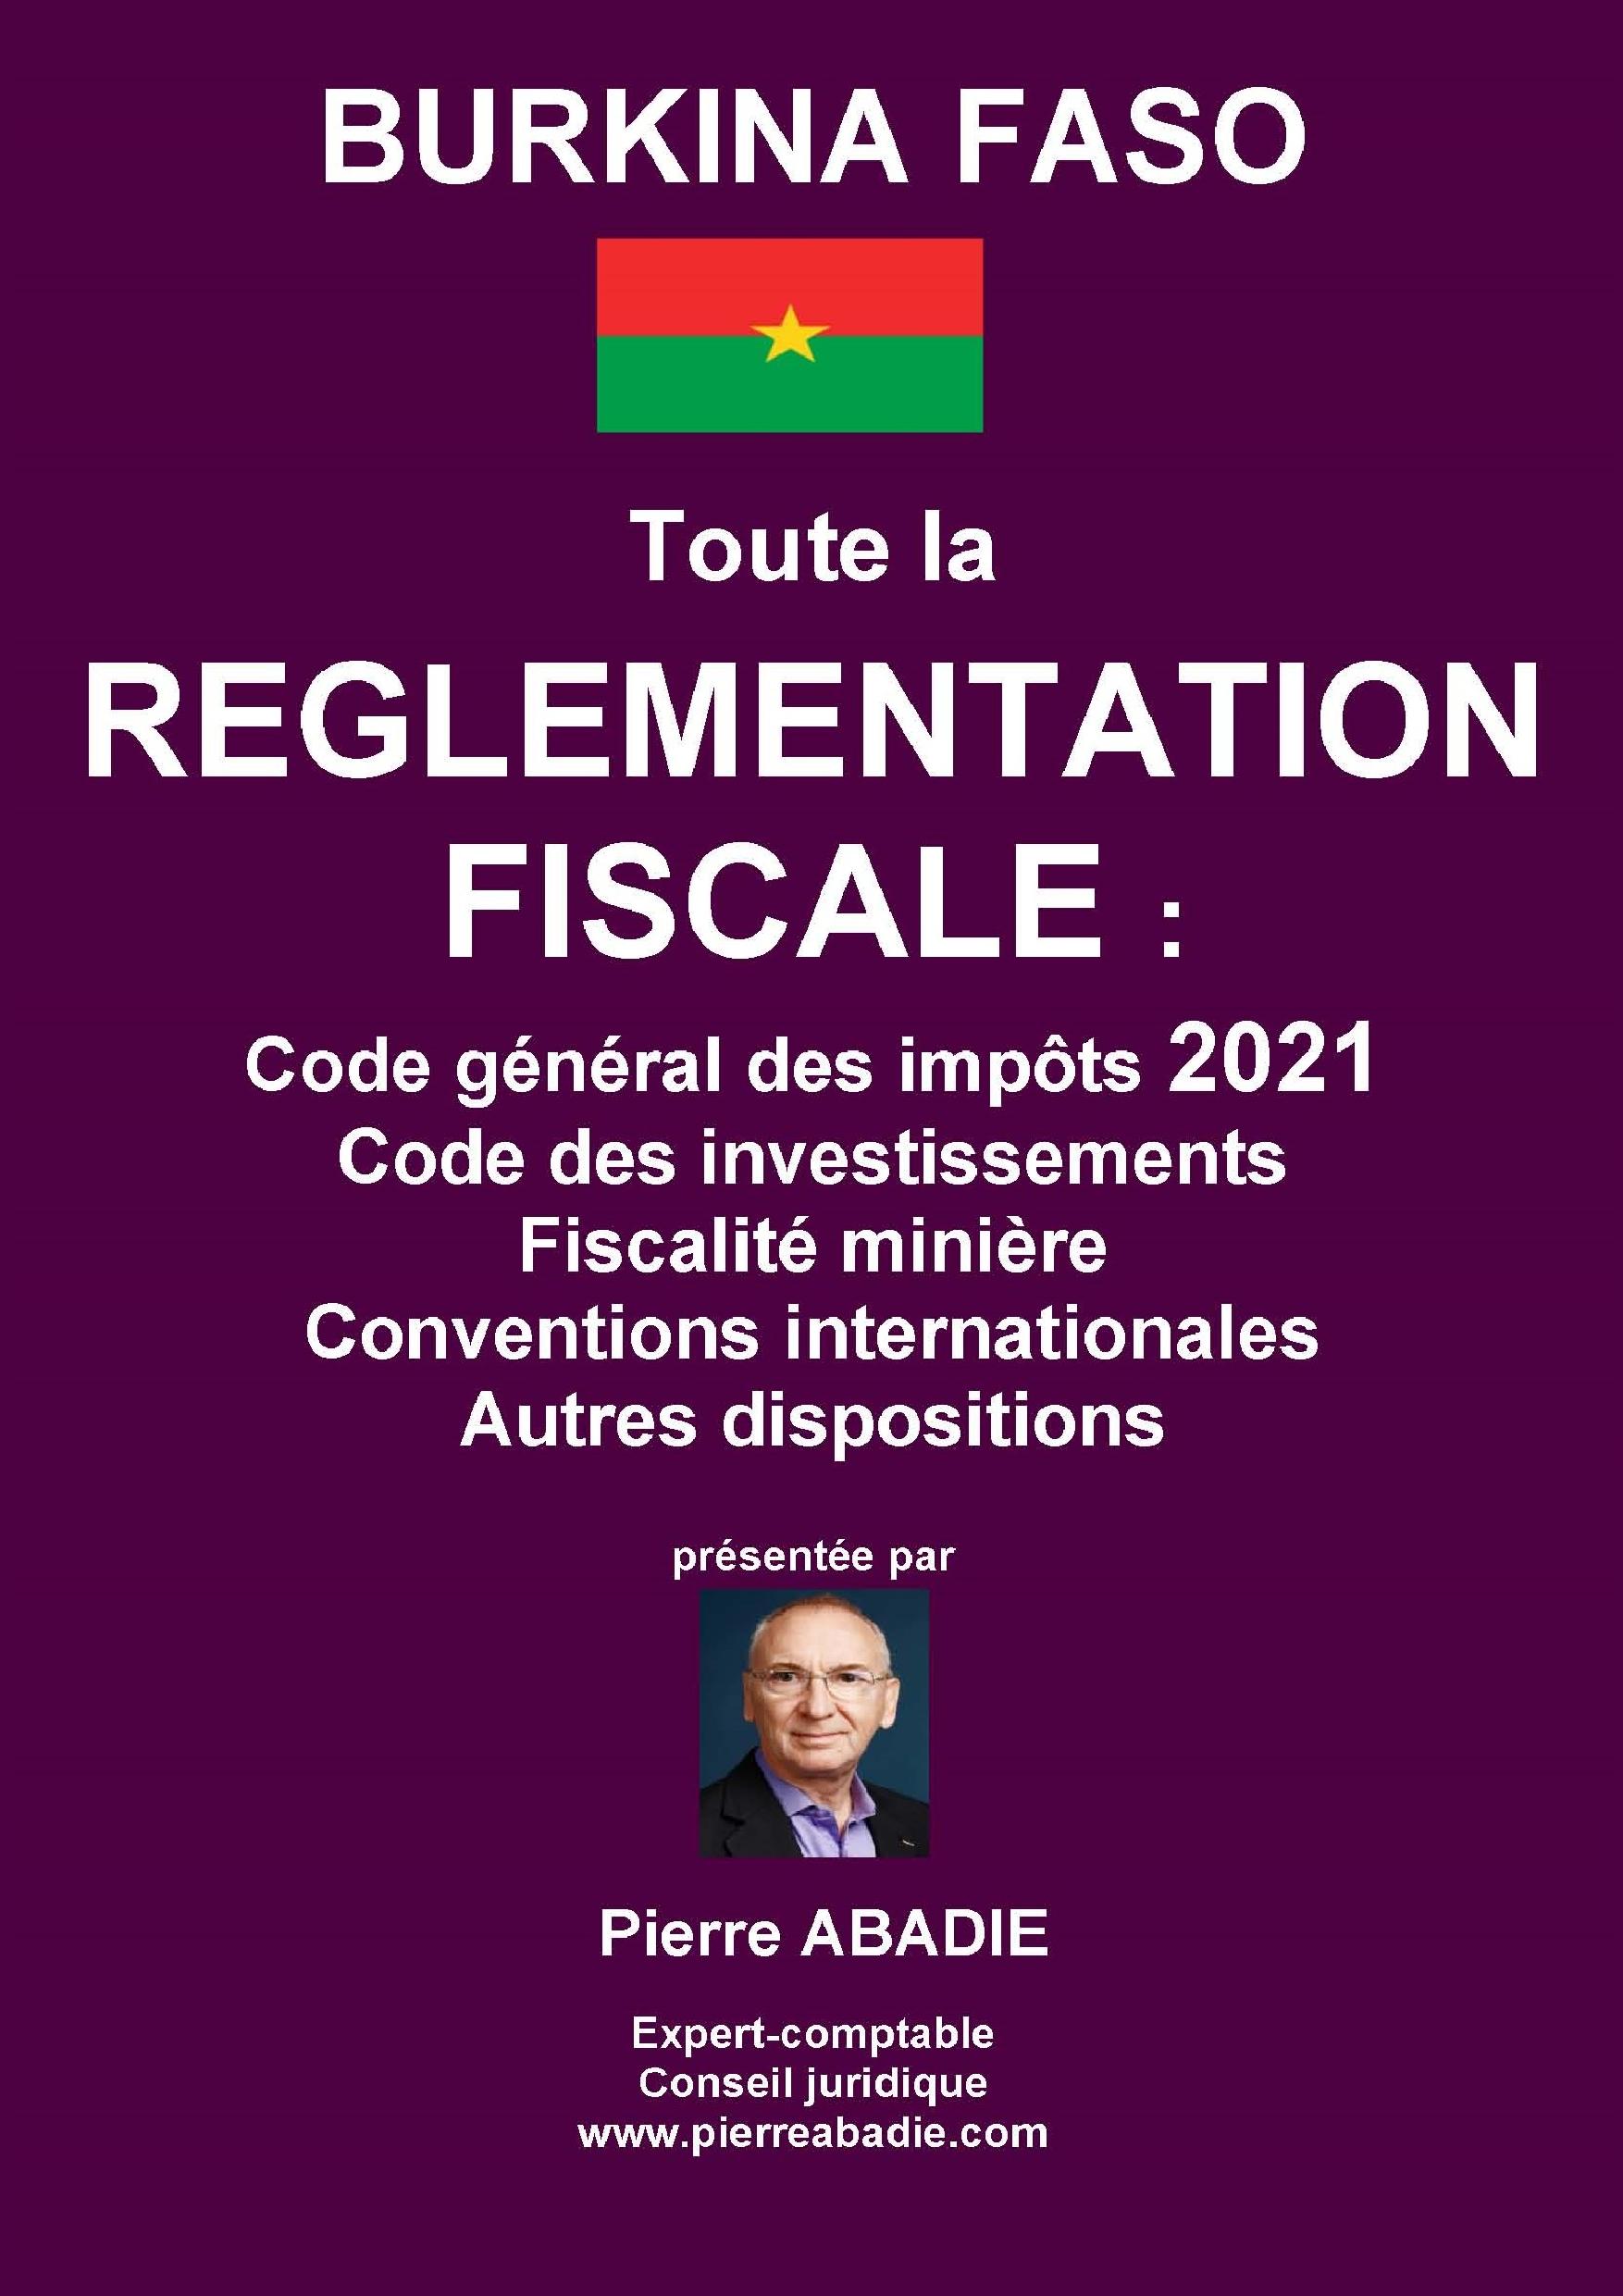 Règlementation fiscale 2021 du Burkina